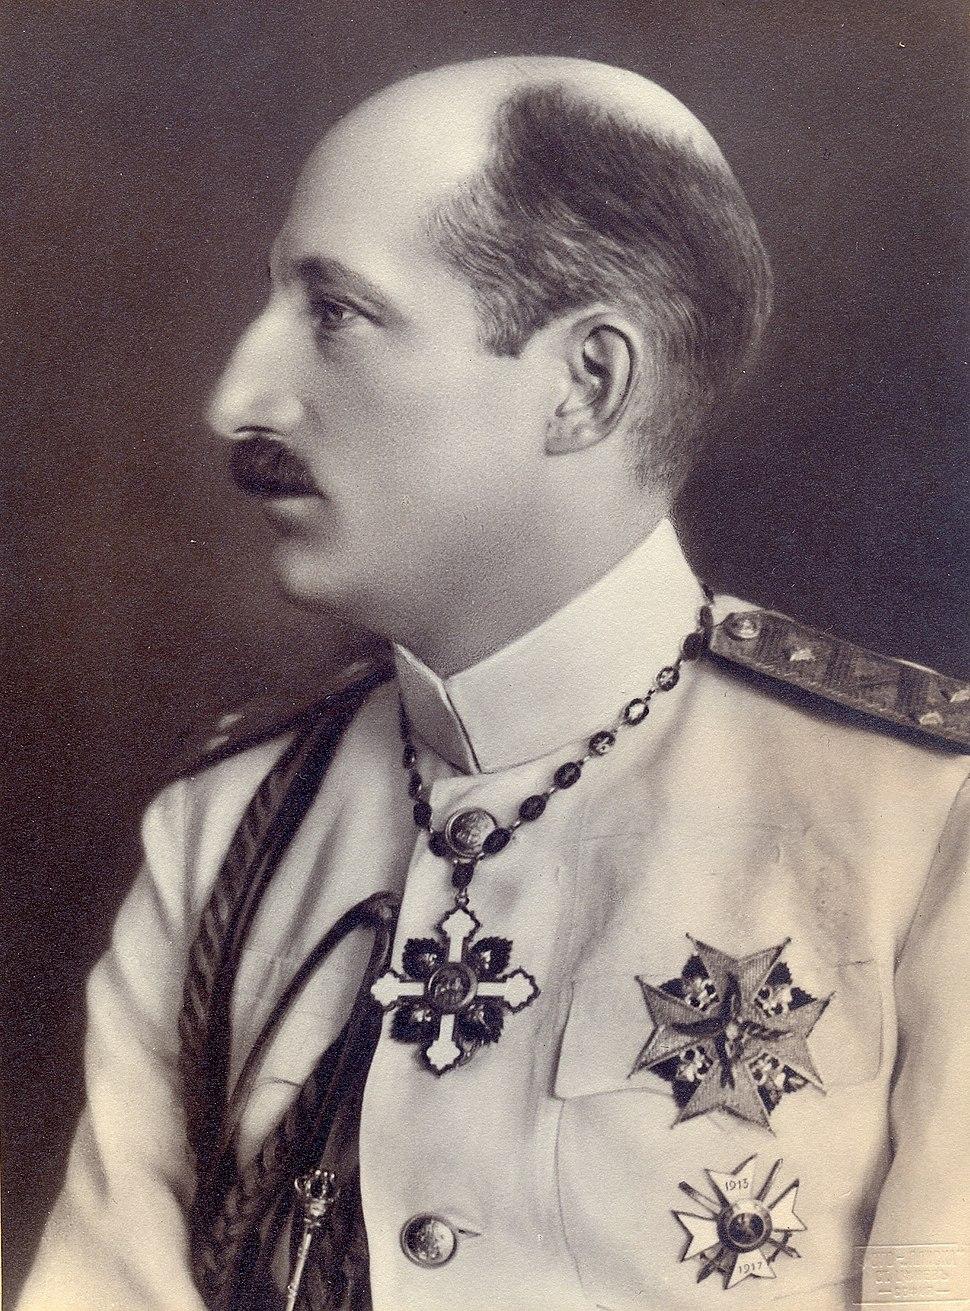 BASA-3K-15-636-1-Boris III of Bulgaria